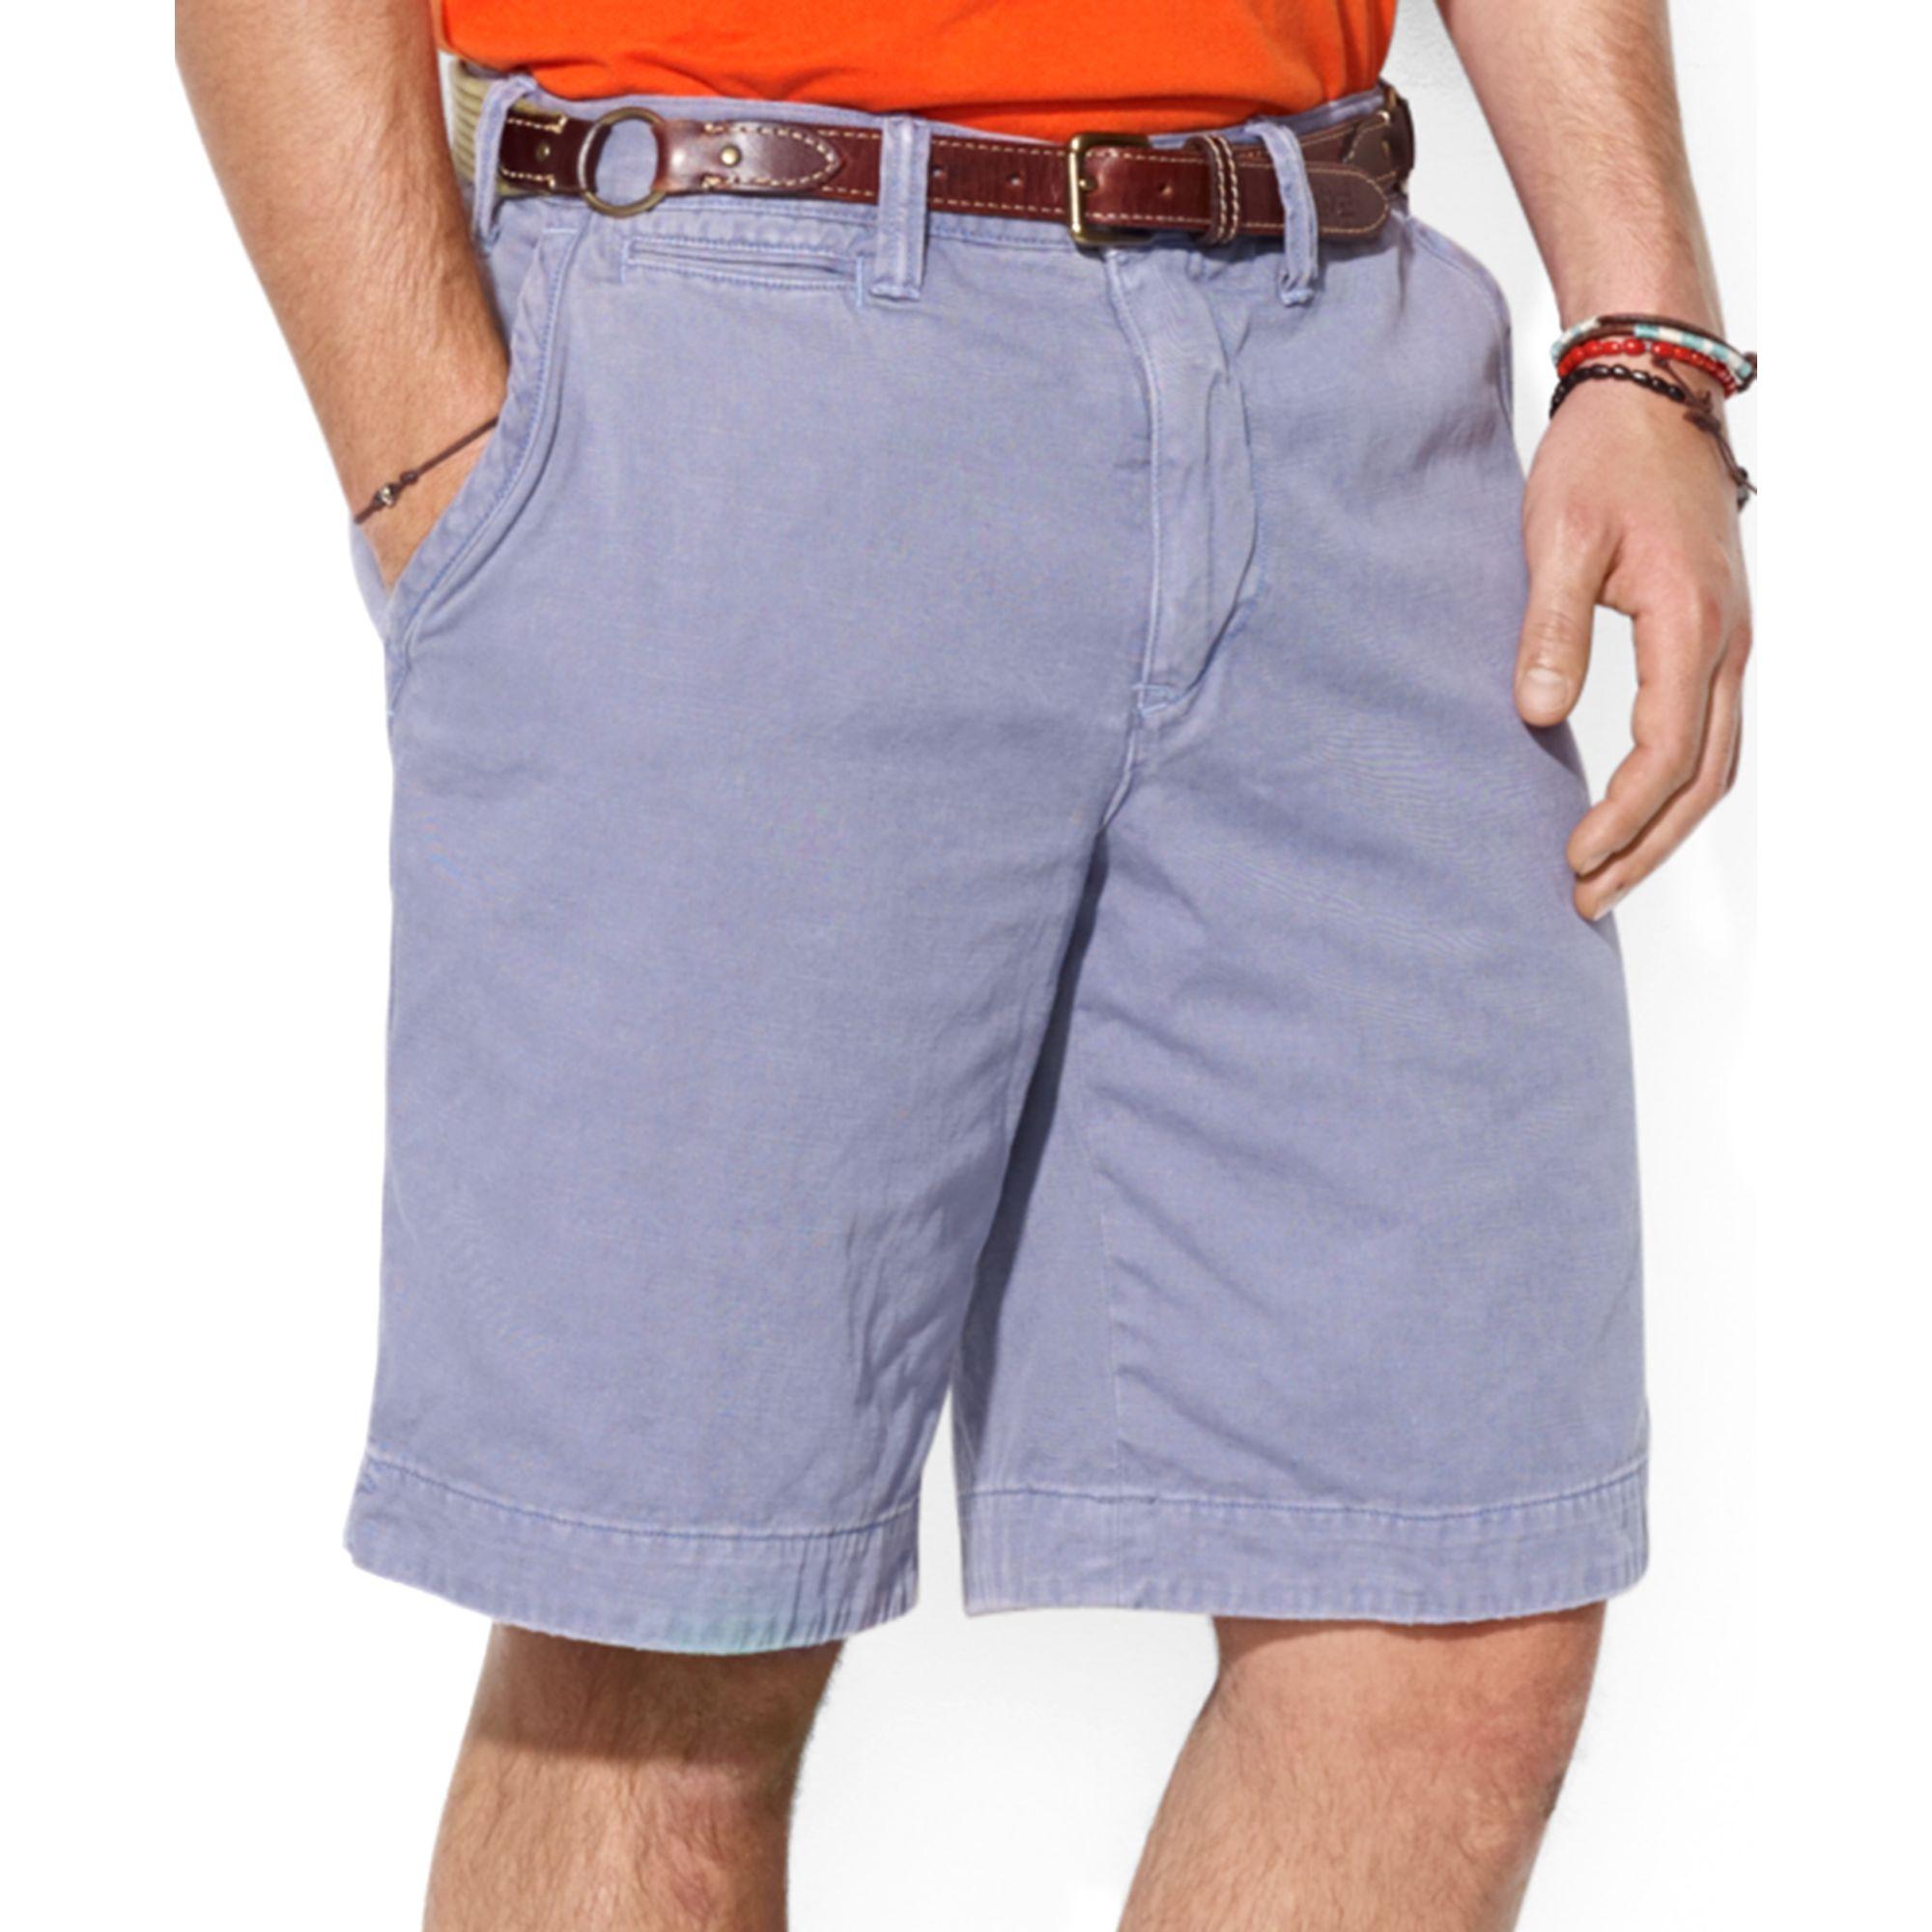 2e4812878a170 Lyst - Ralph Lauren Polo Relaxed Fit Rugged Bleecker Shorts in ...